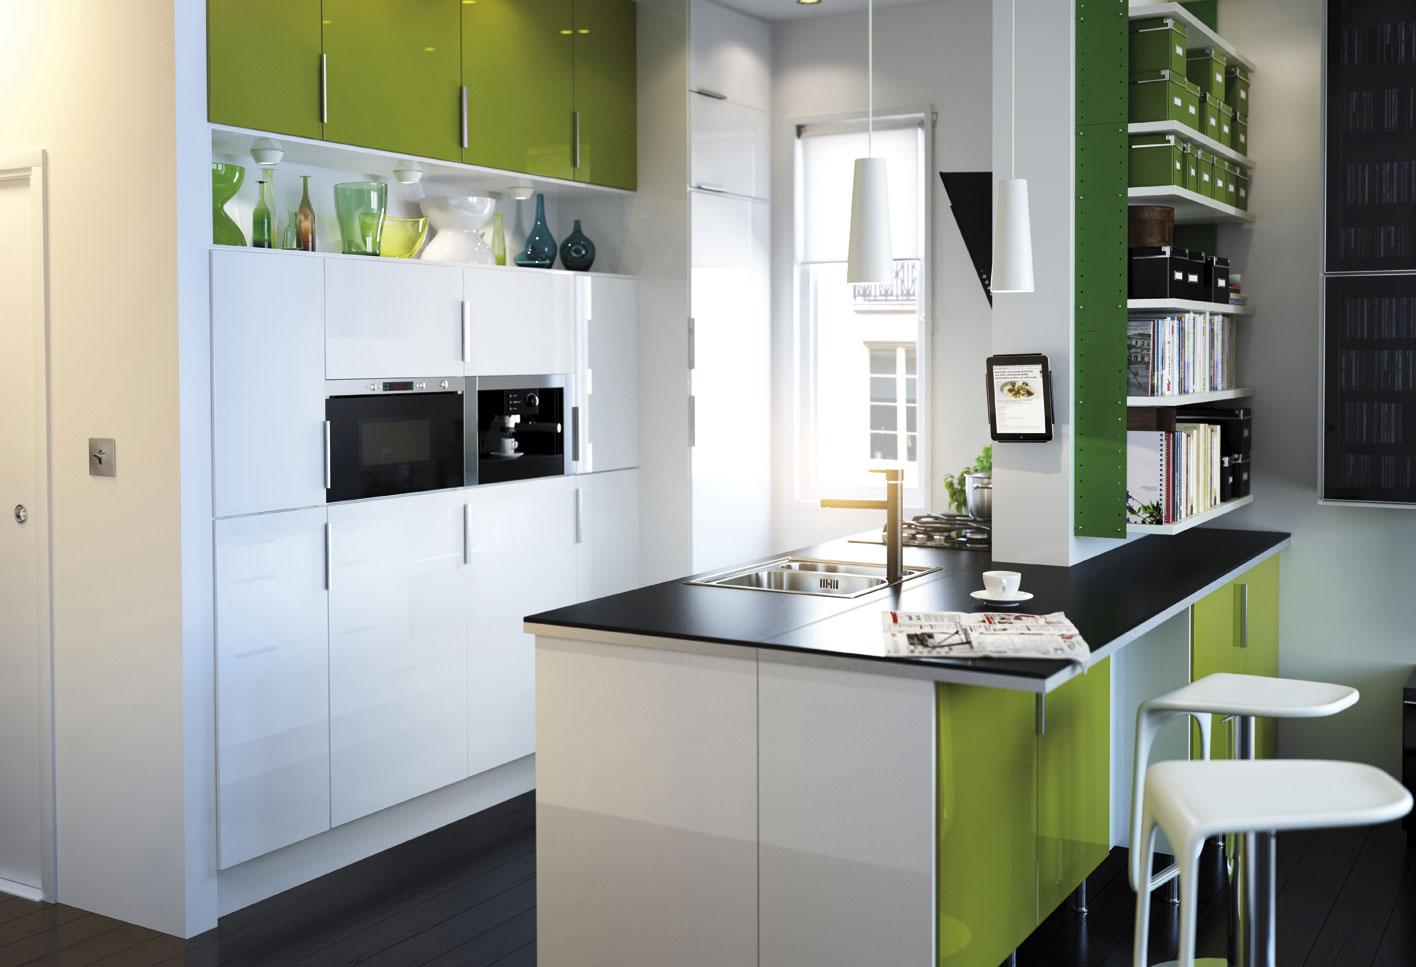 Cocinas Modernas Peque As Estilos Y Dise Os Hoy Lowcost # Muebles Pequenos Para Cocina